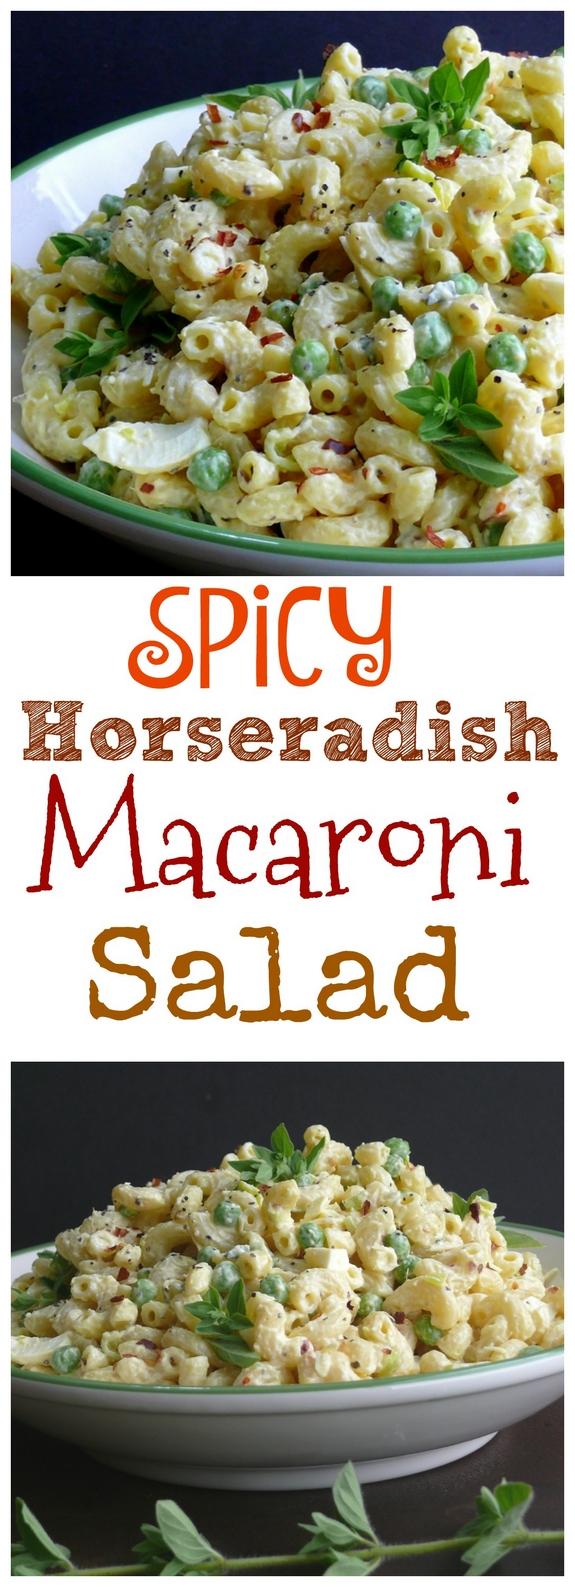 Spicy Horseradish Macaroni Salad